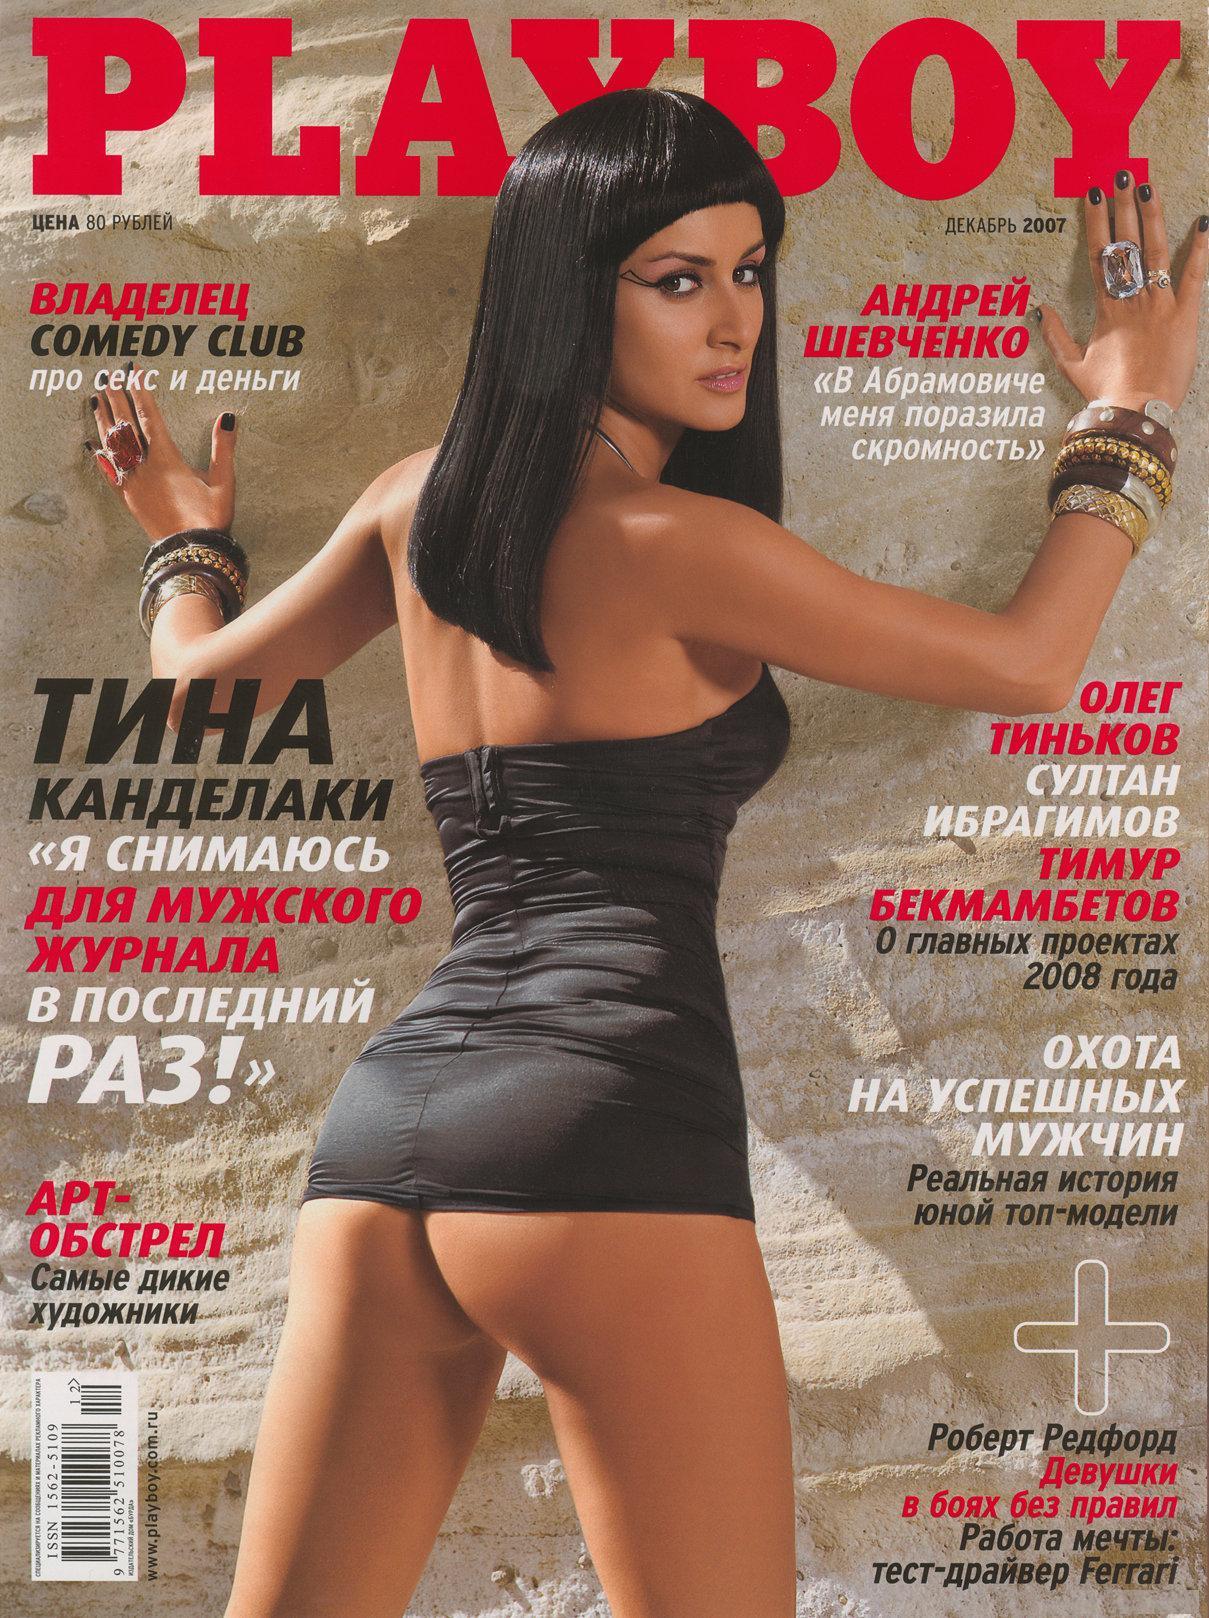 Журнал про секс 6 фотография